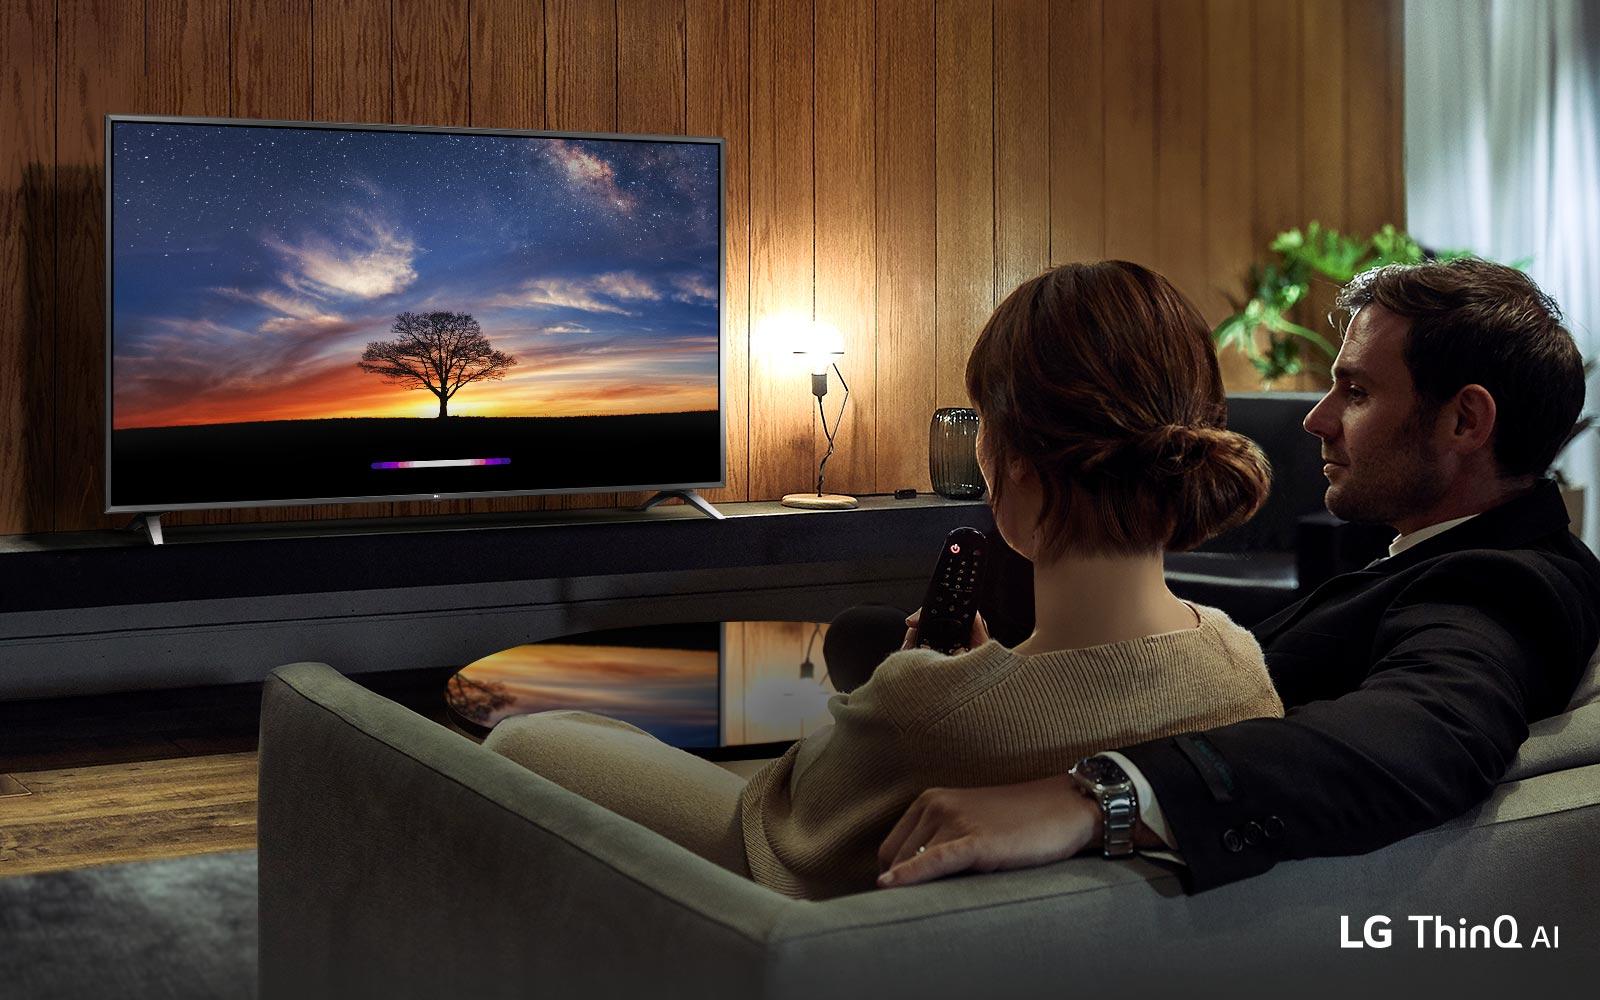 Жизнь полна чудес с телевизором LG AI1